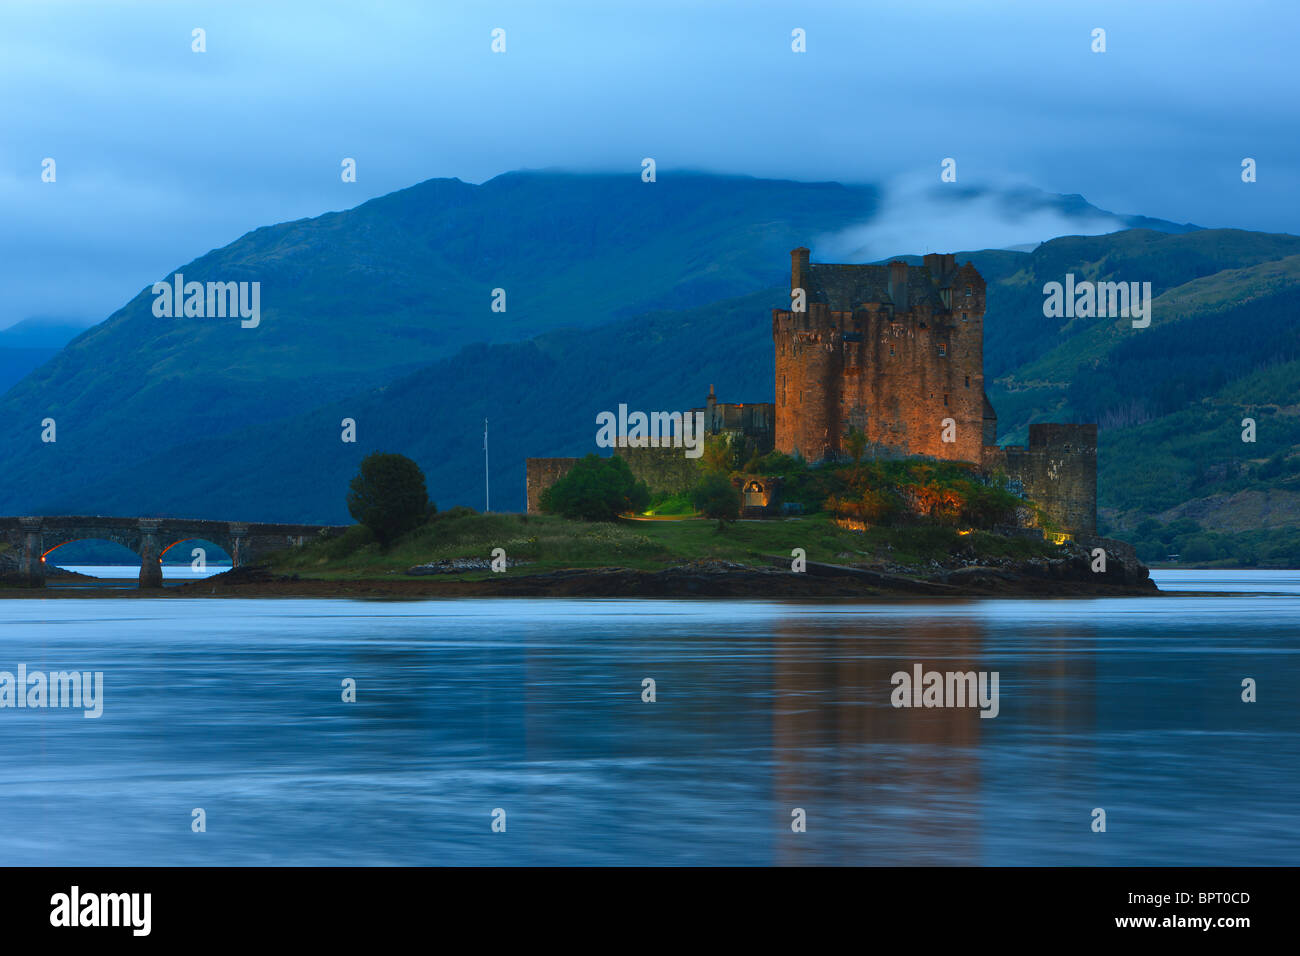 Famous Eilean Donan Castle at the blue hour after sunset, Scotland - Stock Image